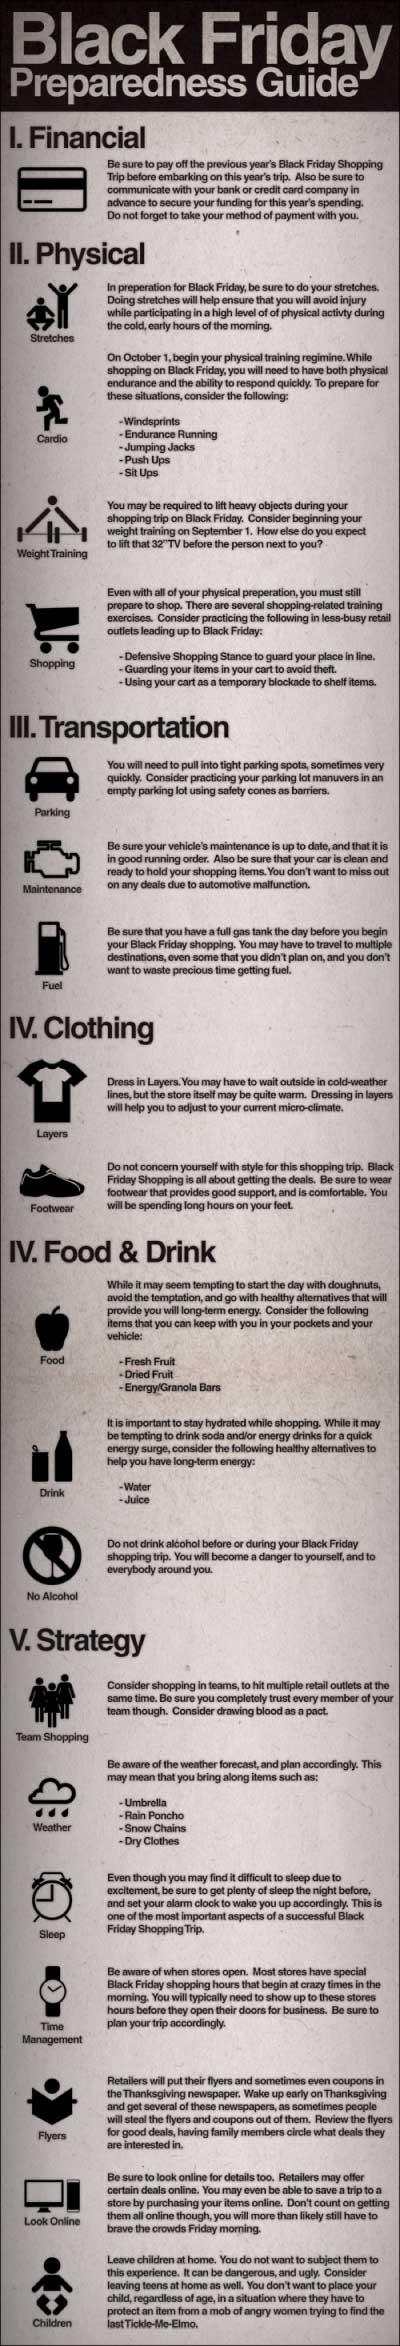 Black Friday Preparedness Guide